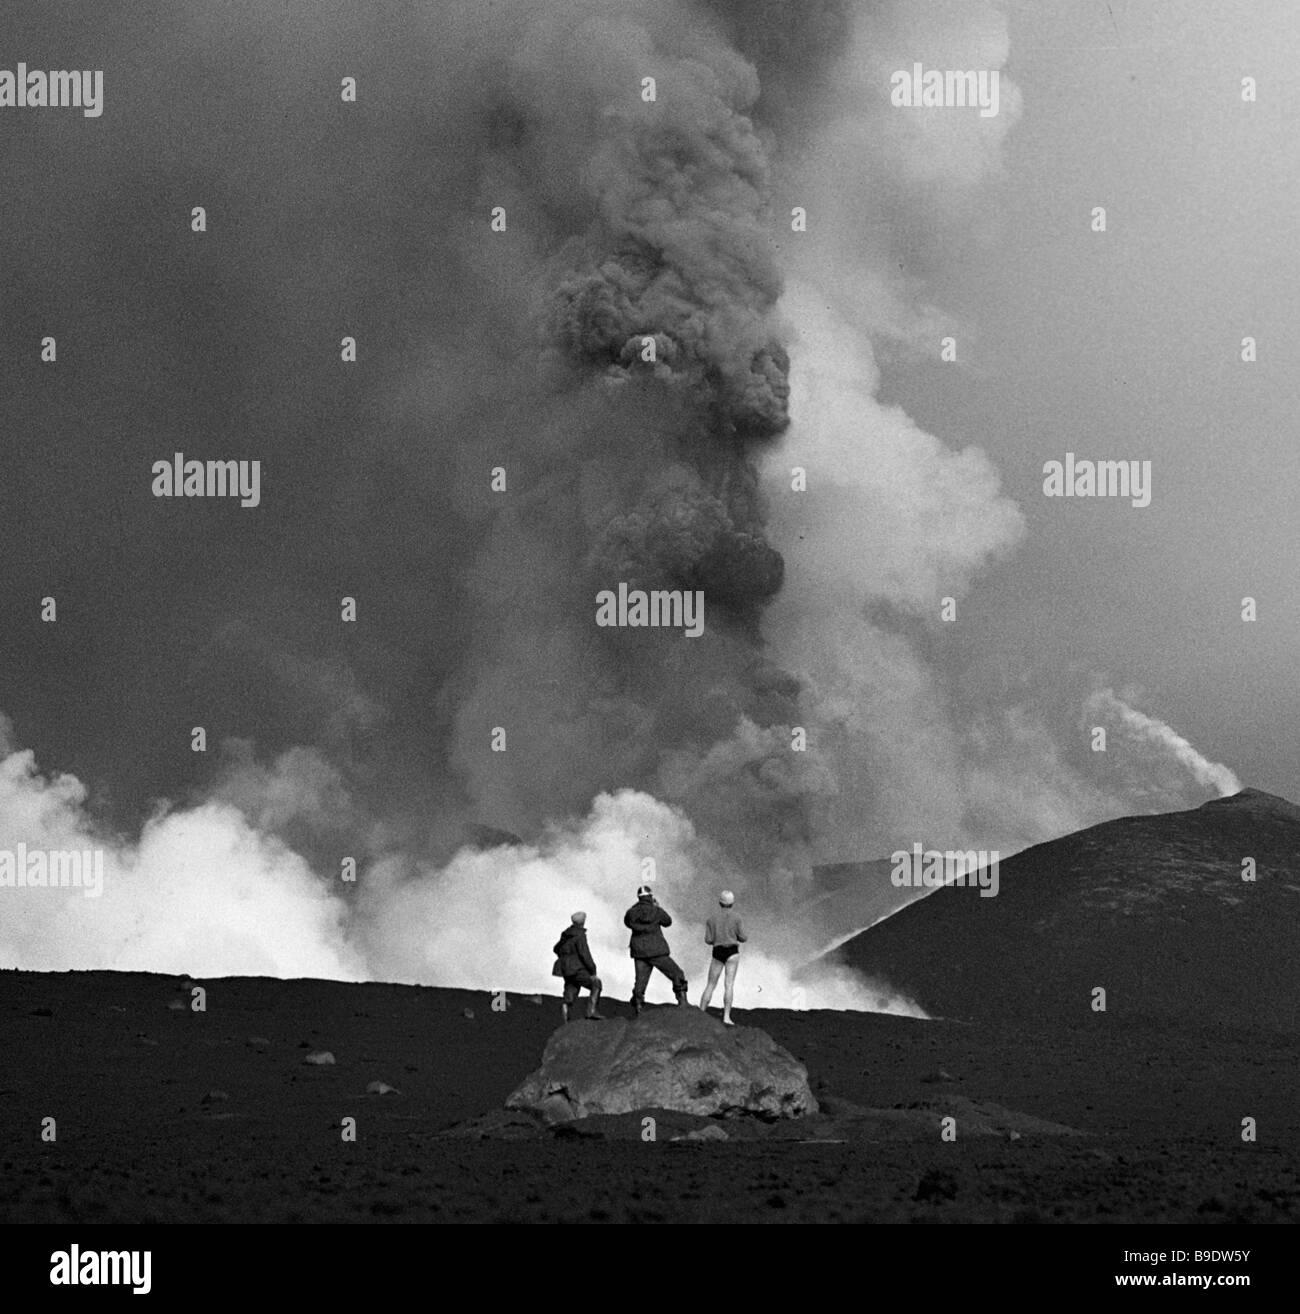 Volcanologists watching fumaroles - Stock Image